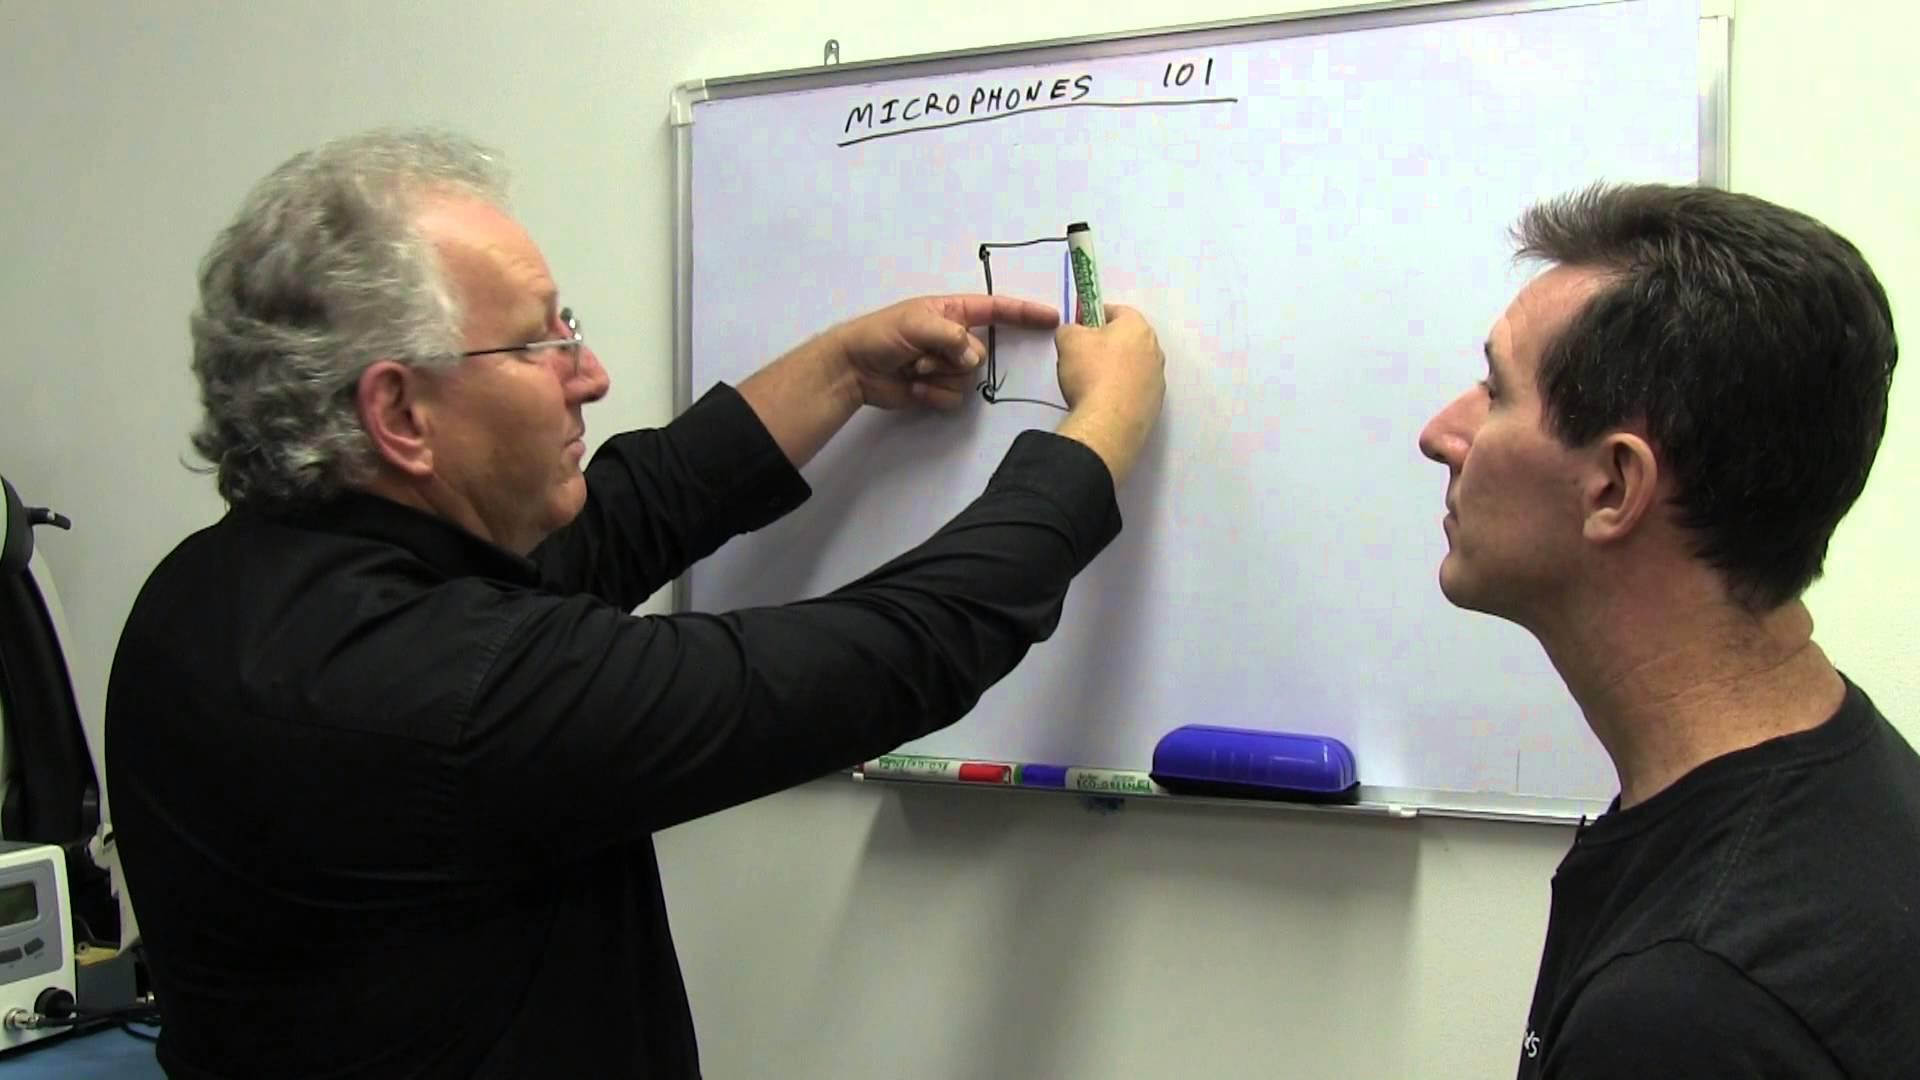 EEVblog #608 – Condenser & Electret Microphone Construction